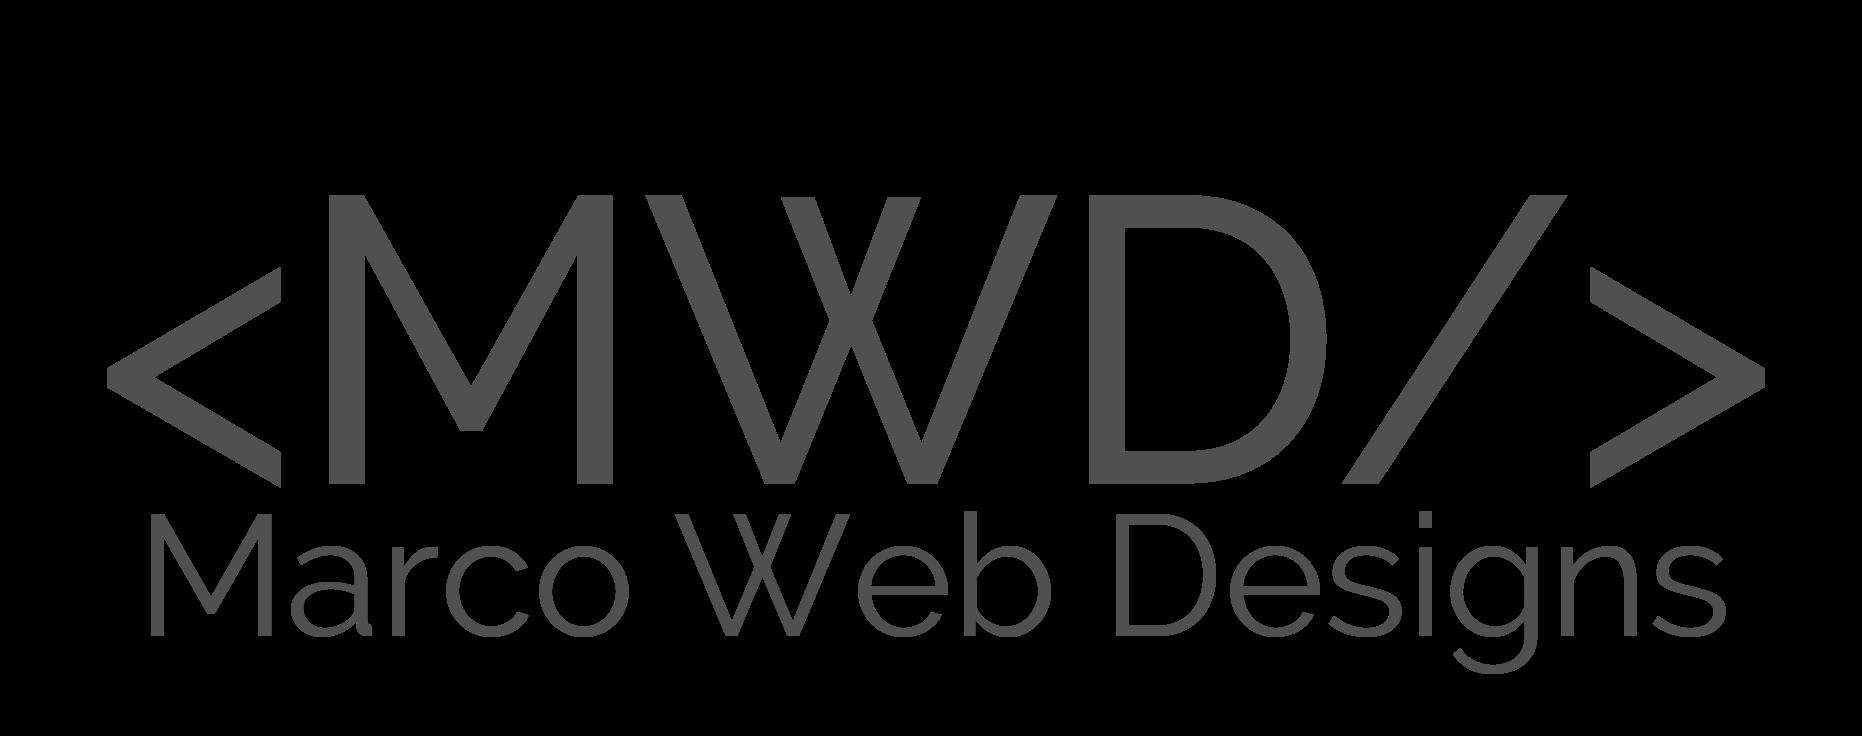 Marco Web Designs - Jacksonville FL Website Development